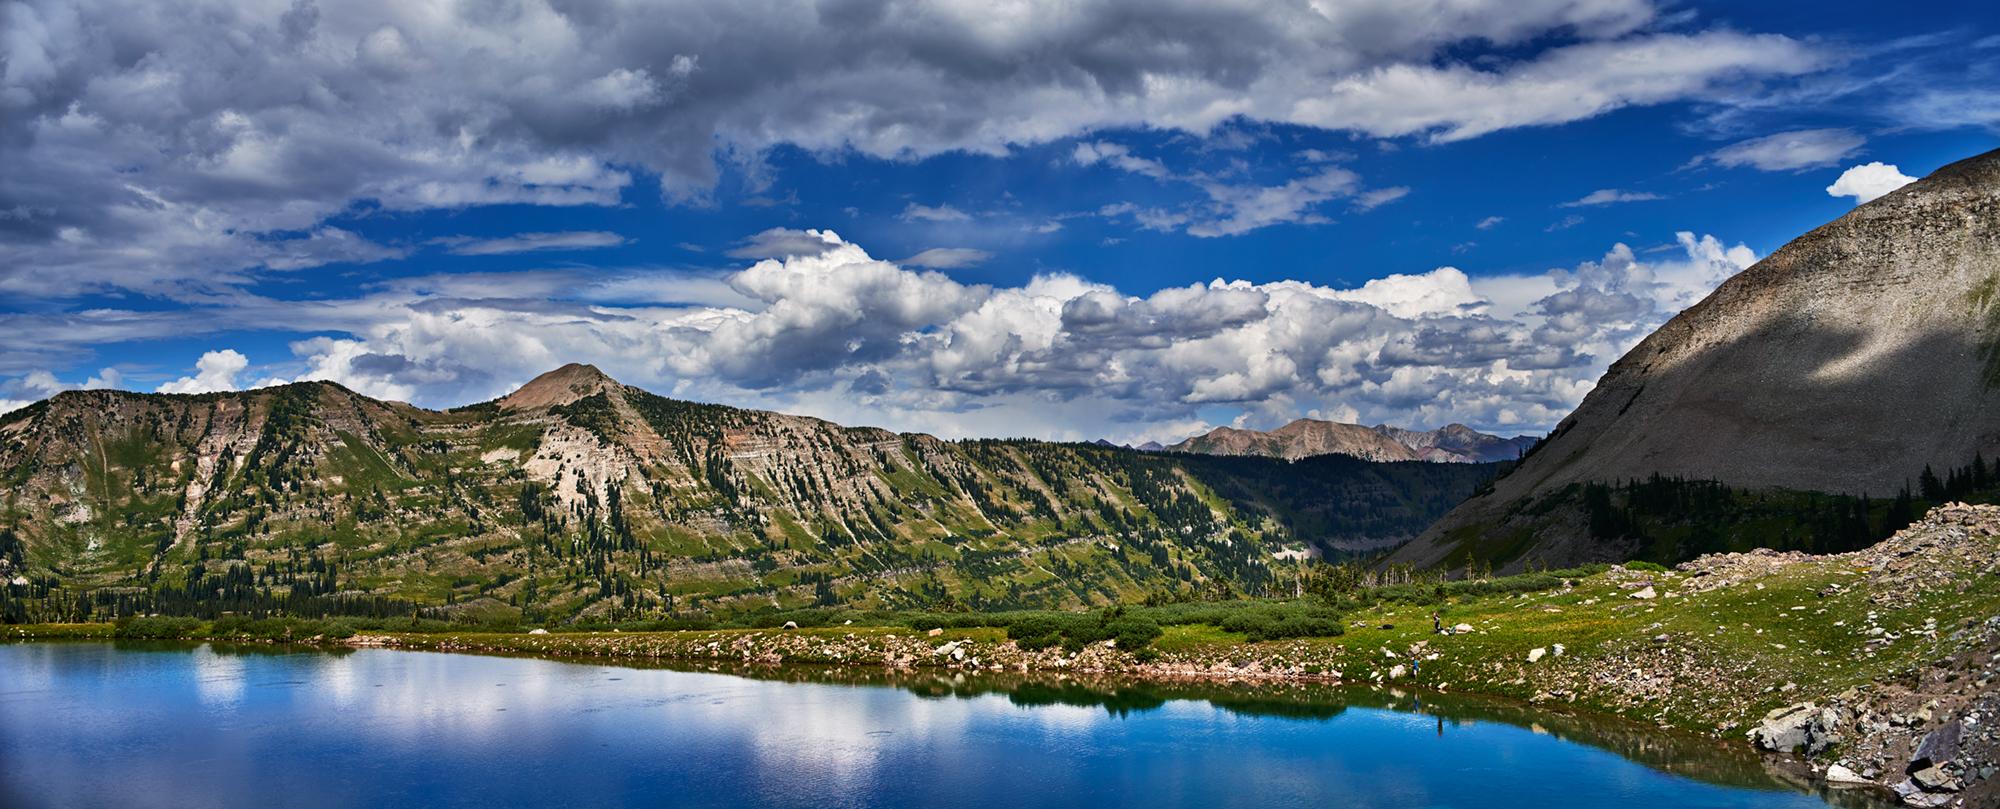 blue lake pano.jpg